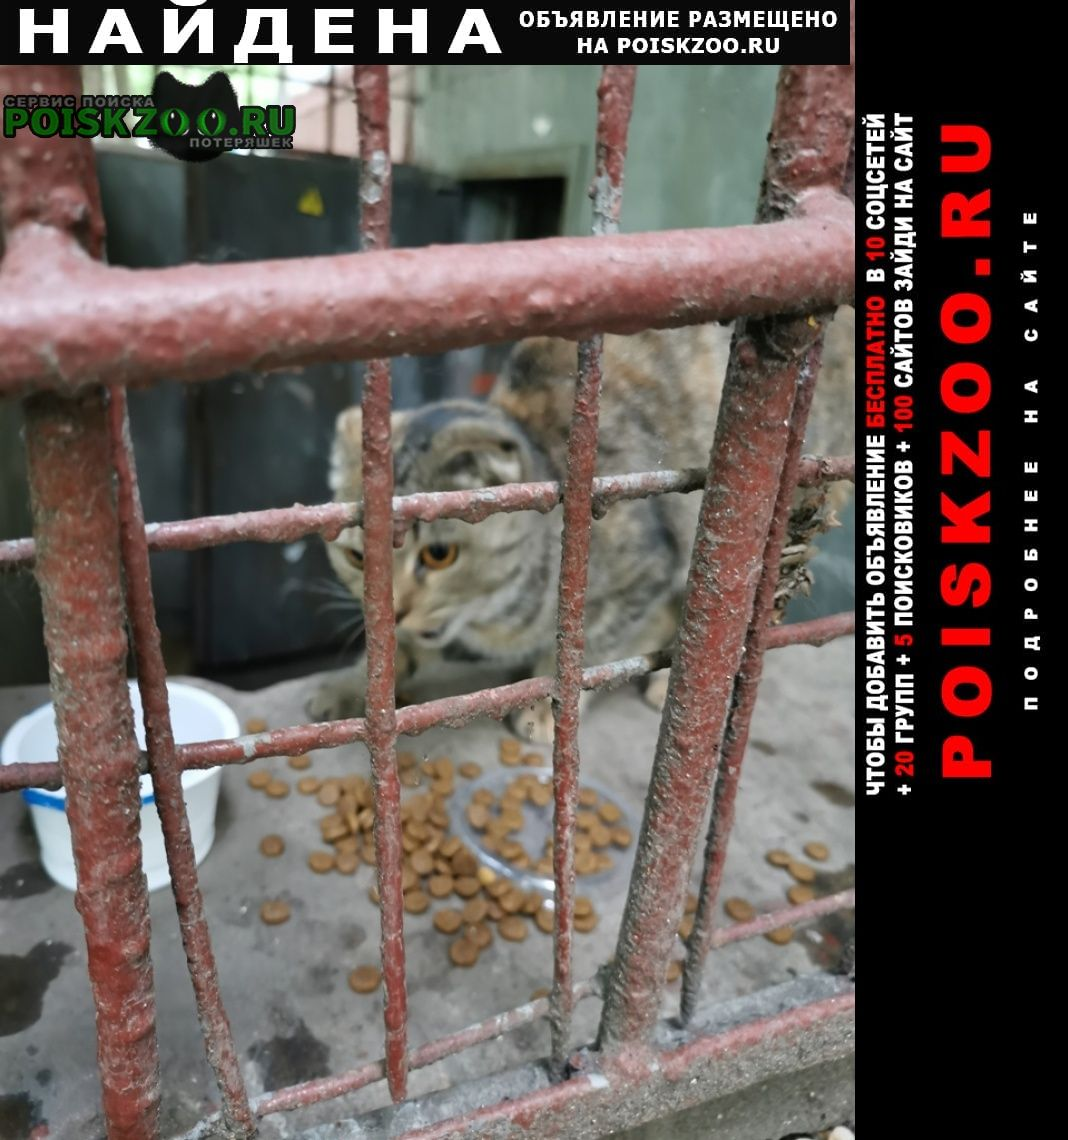 Найдена кошка вислоухая с коротким хвостом Москва